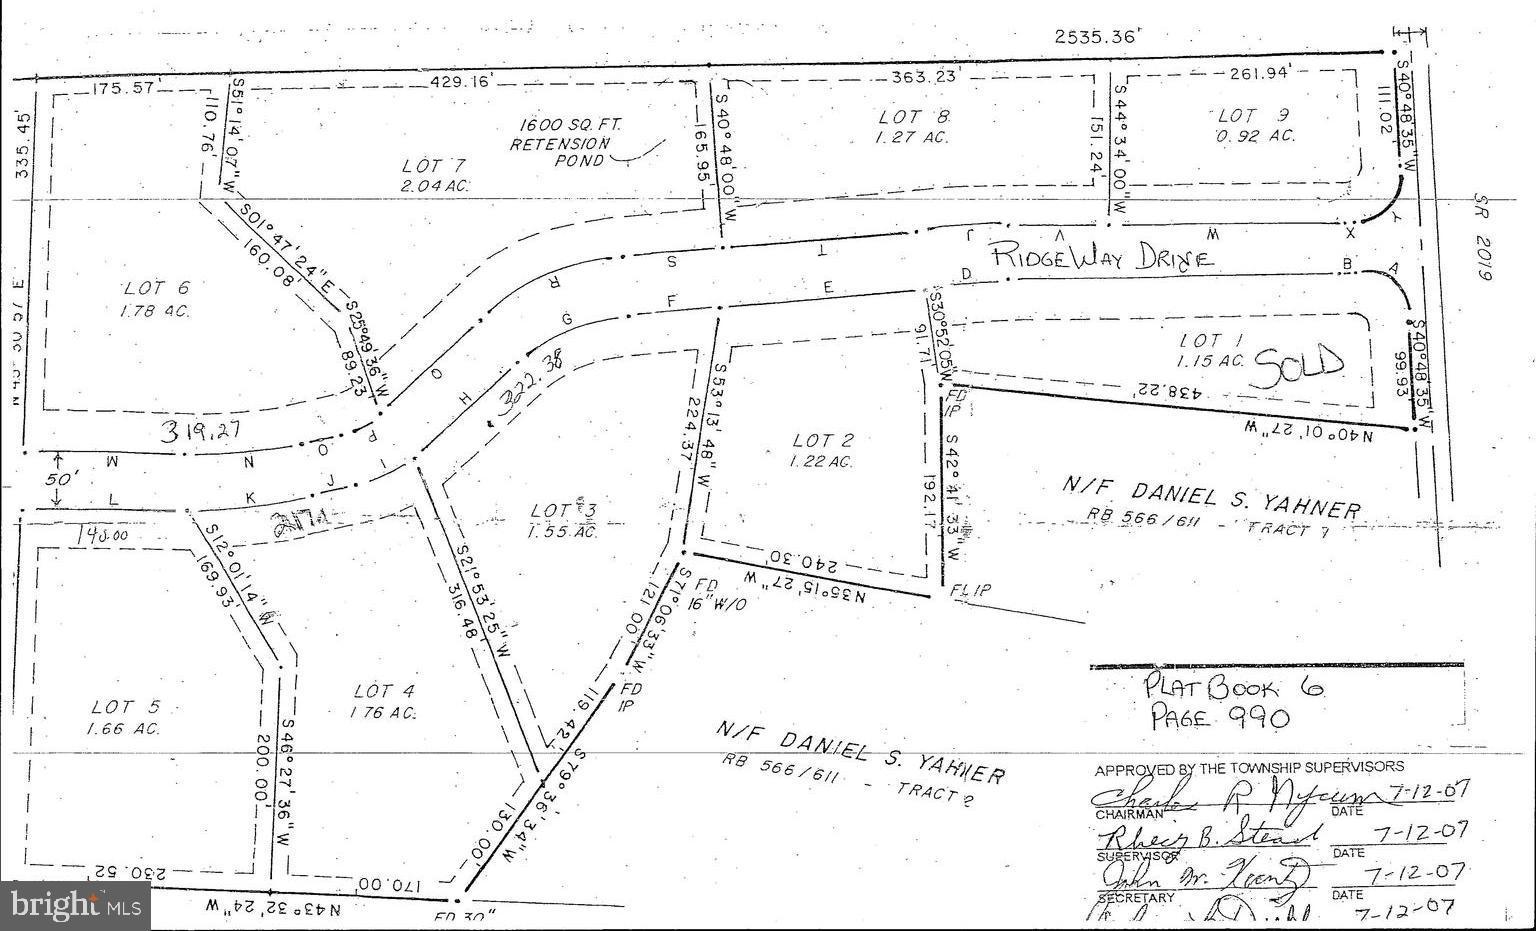 Lot #5 RIDGE WAY DRIVE, EVERETT, PA 15537